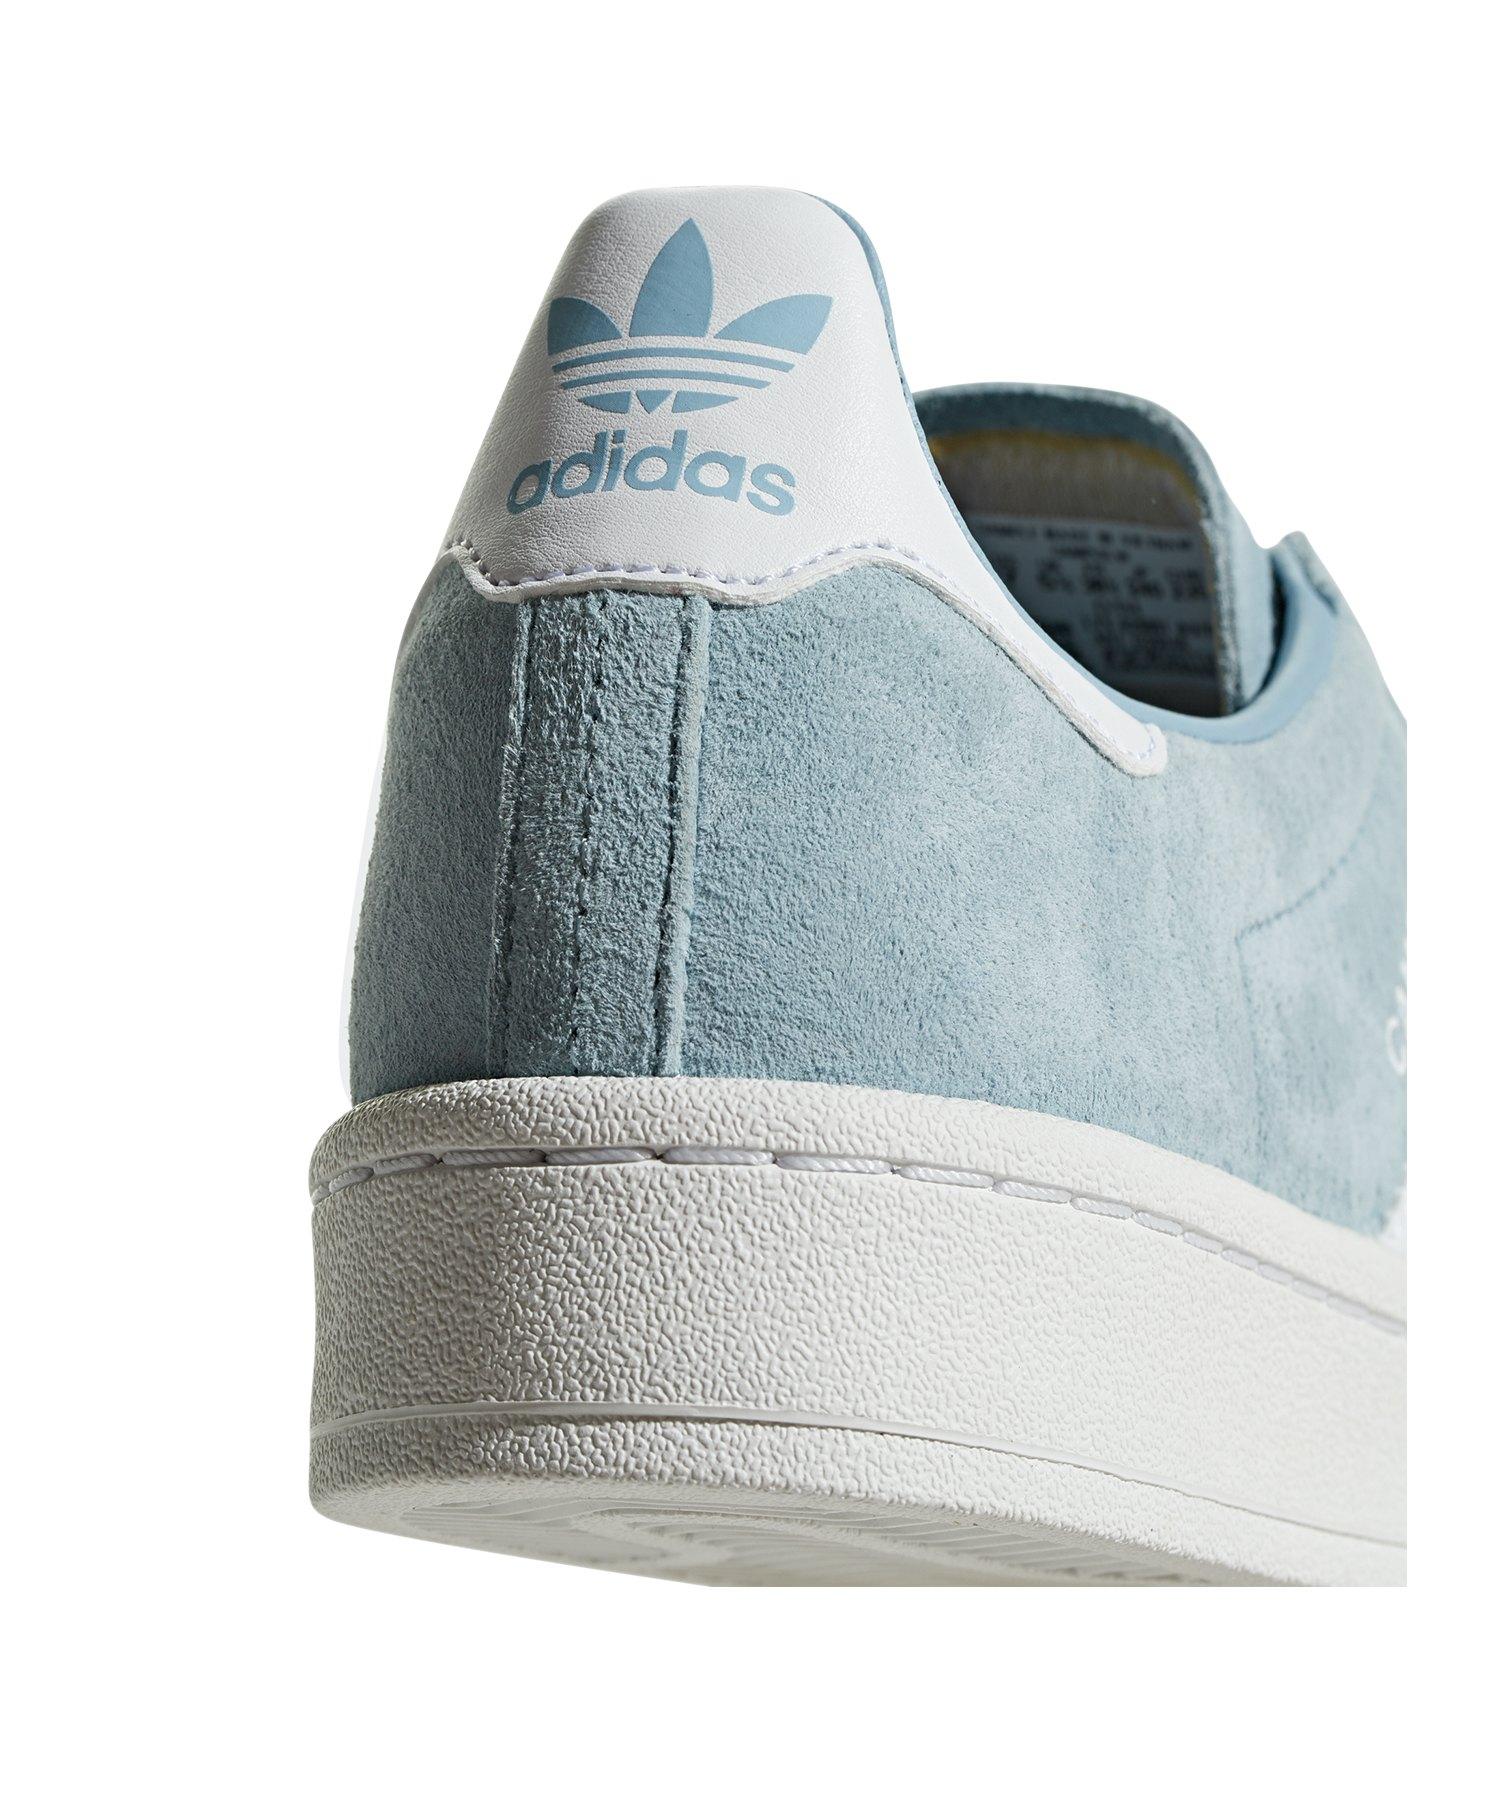 eea9a9749eb31e ... adidas Originals Campus Sneaker Damen Blau Weiss - blau ...